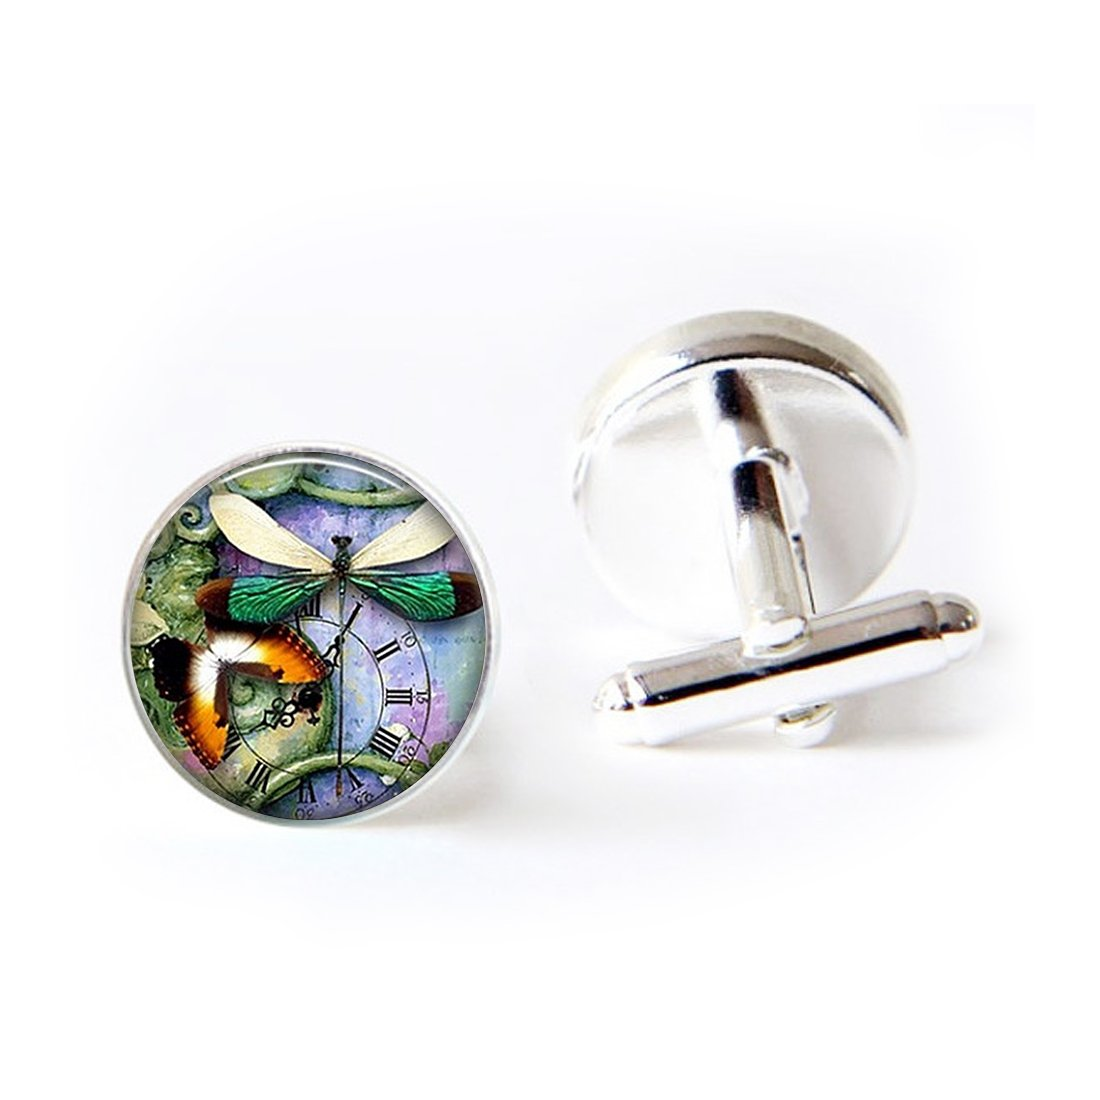 JEANCZ Jewelry Stainless Cufflinks Vintage Pattern ButterfliesClassic Tuxedo Shirt Cufflinks Elegant Storage Display Box LCZ0124-BSSLY-SL-LSZBS-0242